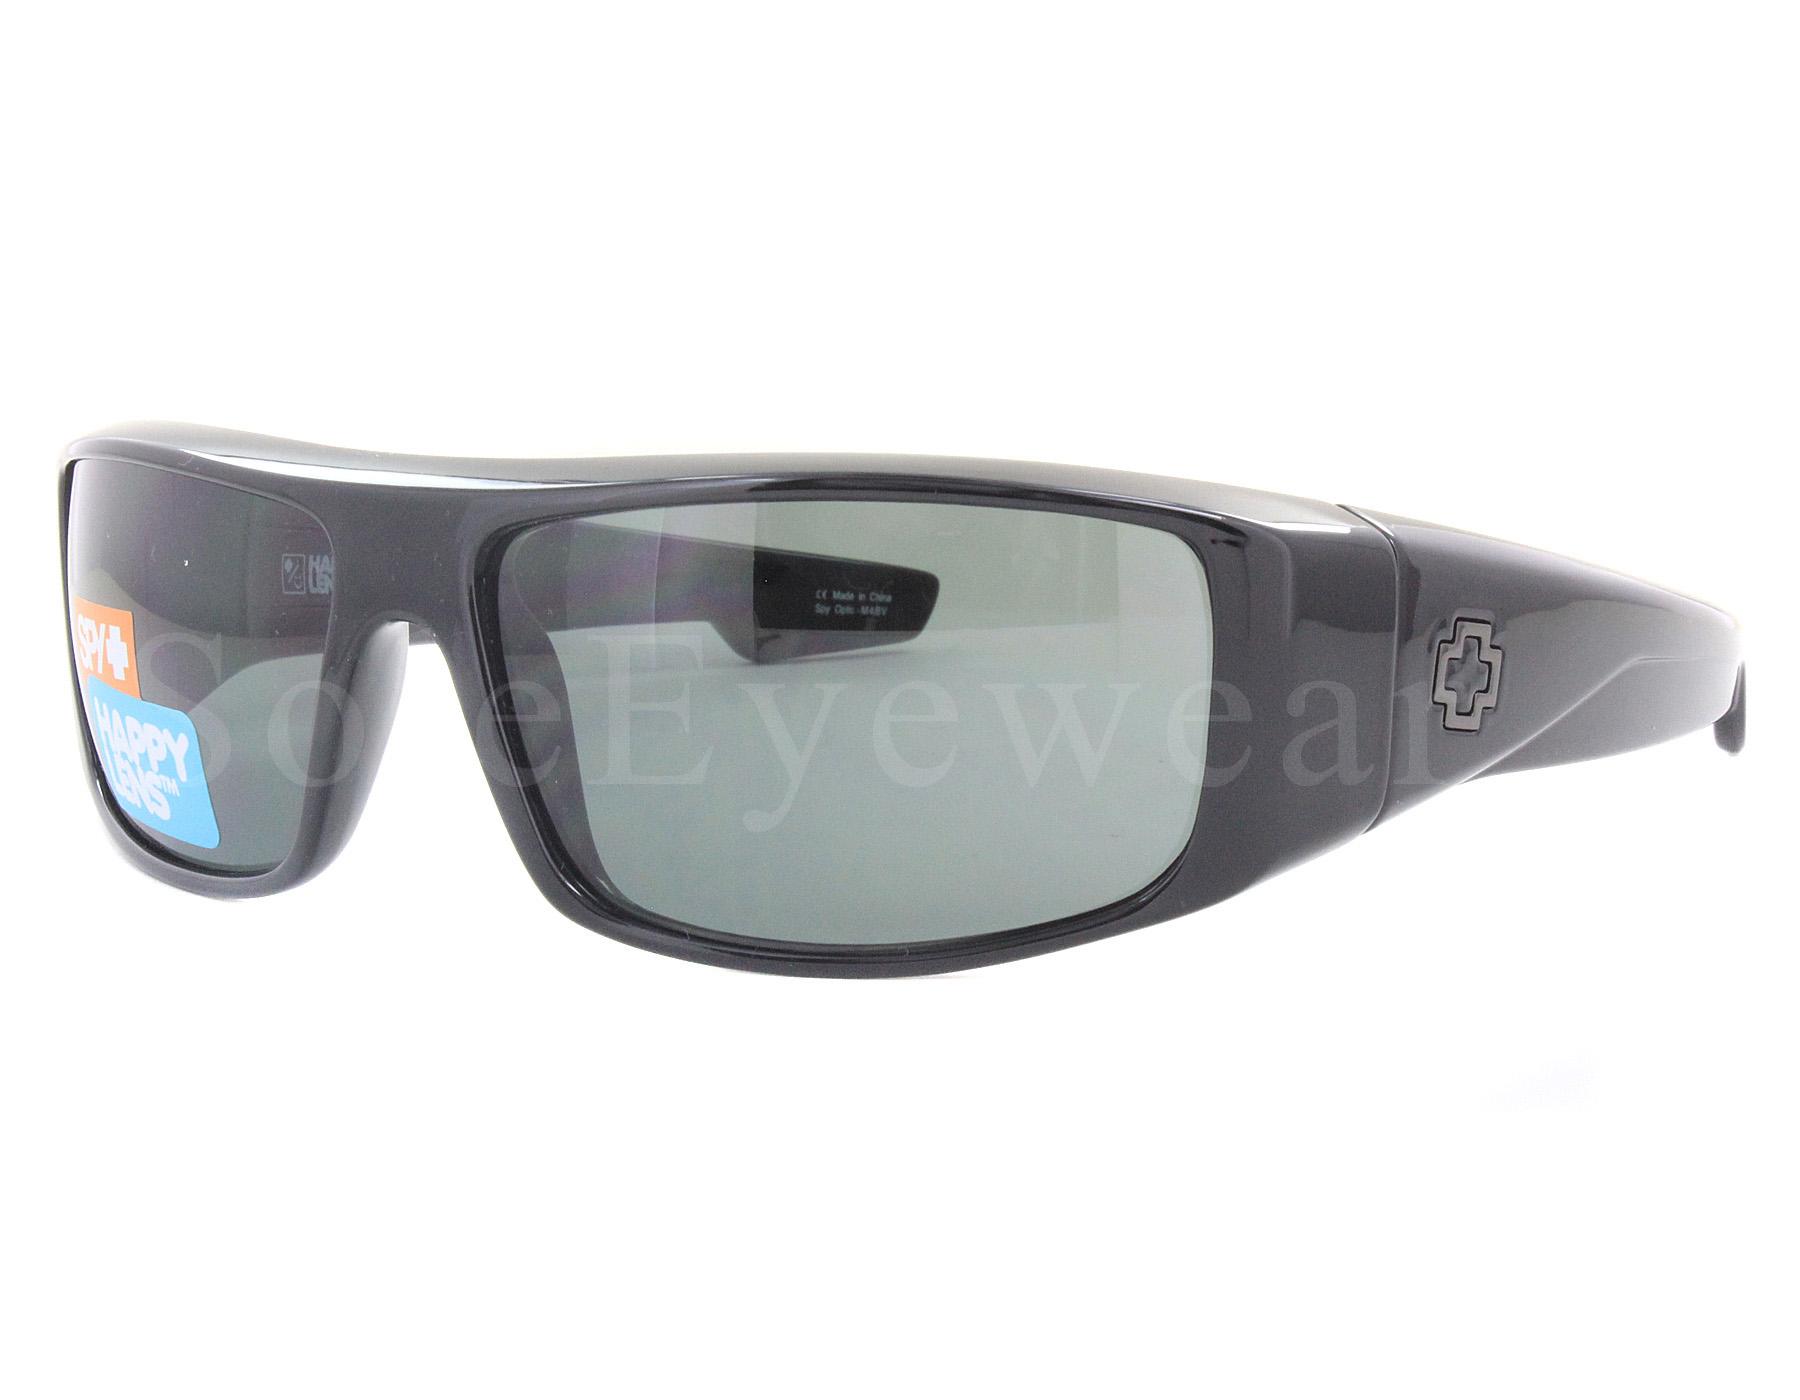 5c87f501285 Details about NEW Spy Optics Logan 670939038864 Black   Happy Gray Green  Polarized Sunglasses